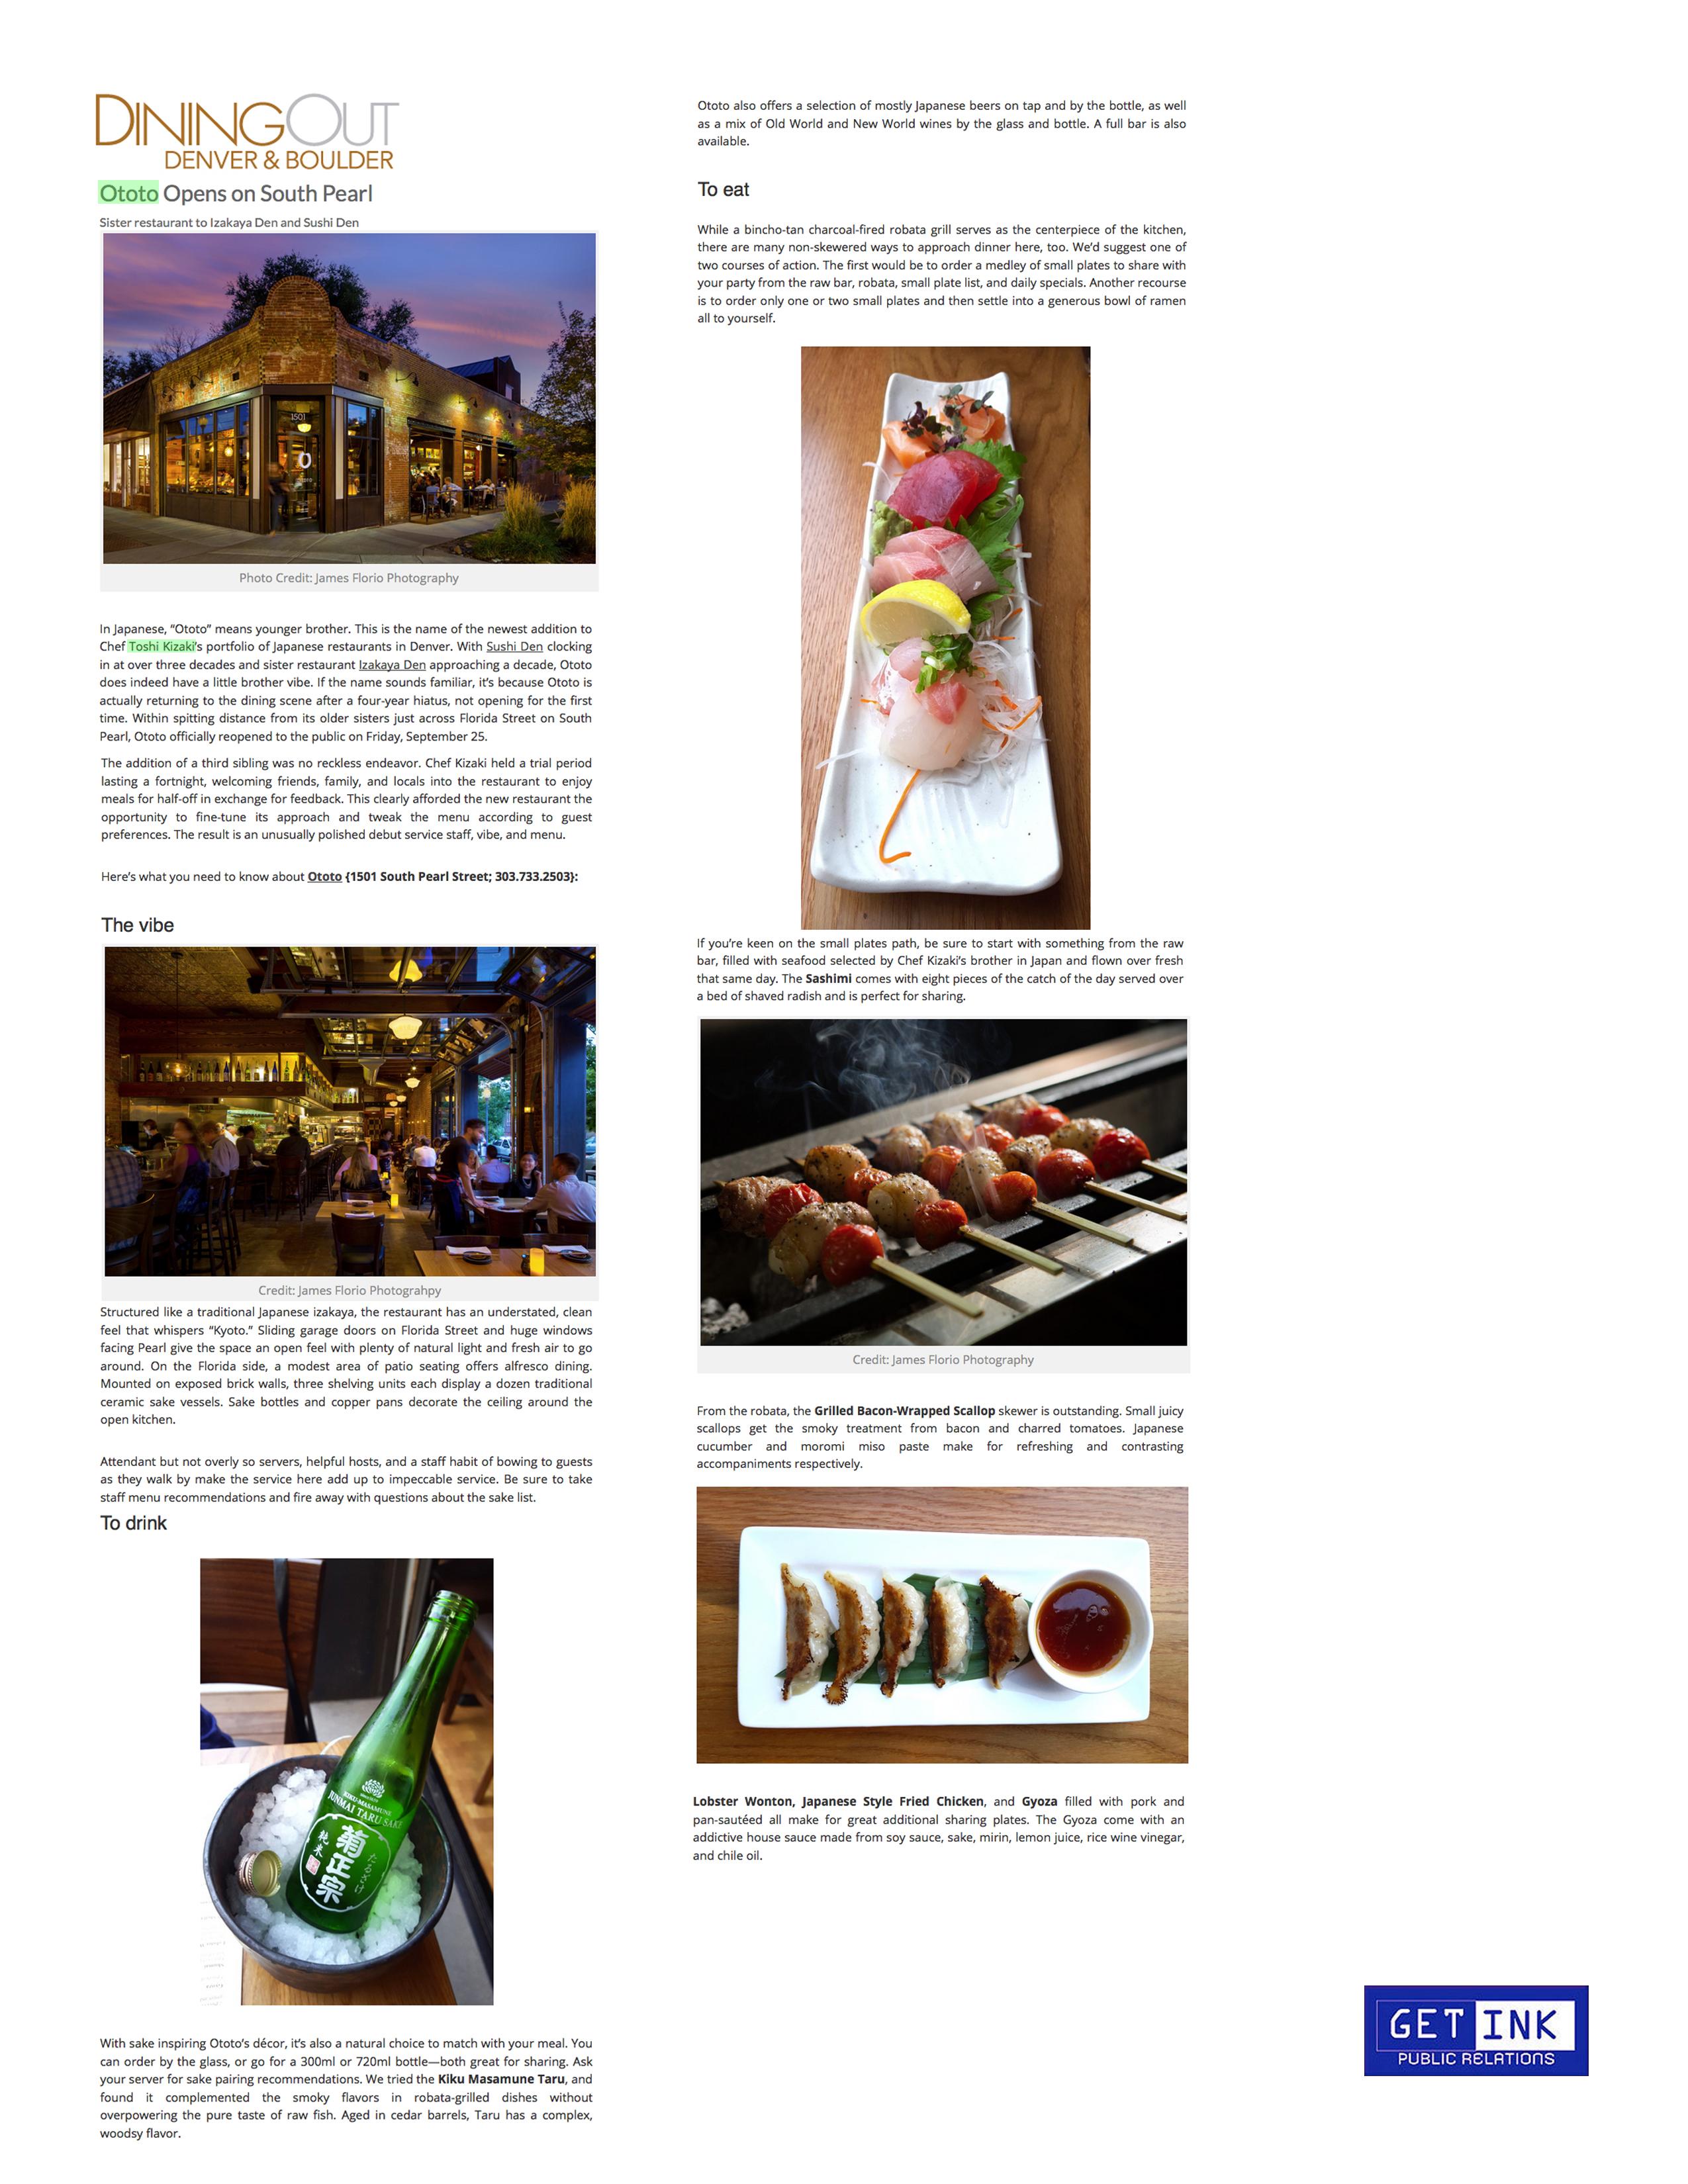 DiningOut.com 10.9.15 Part 1